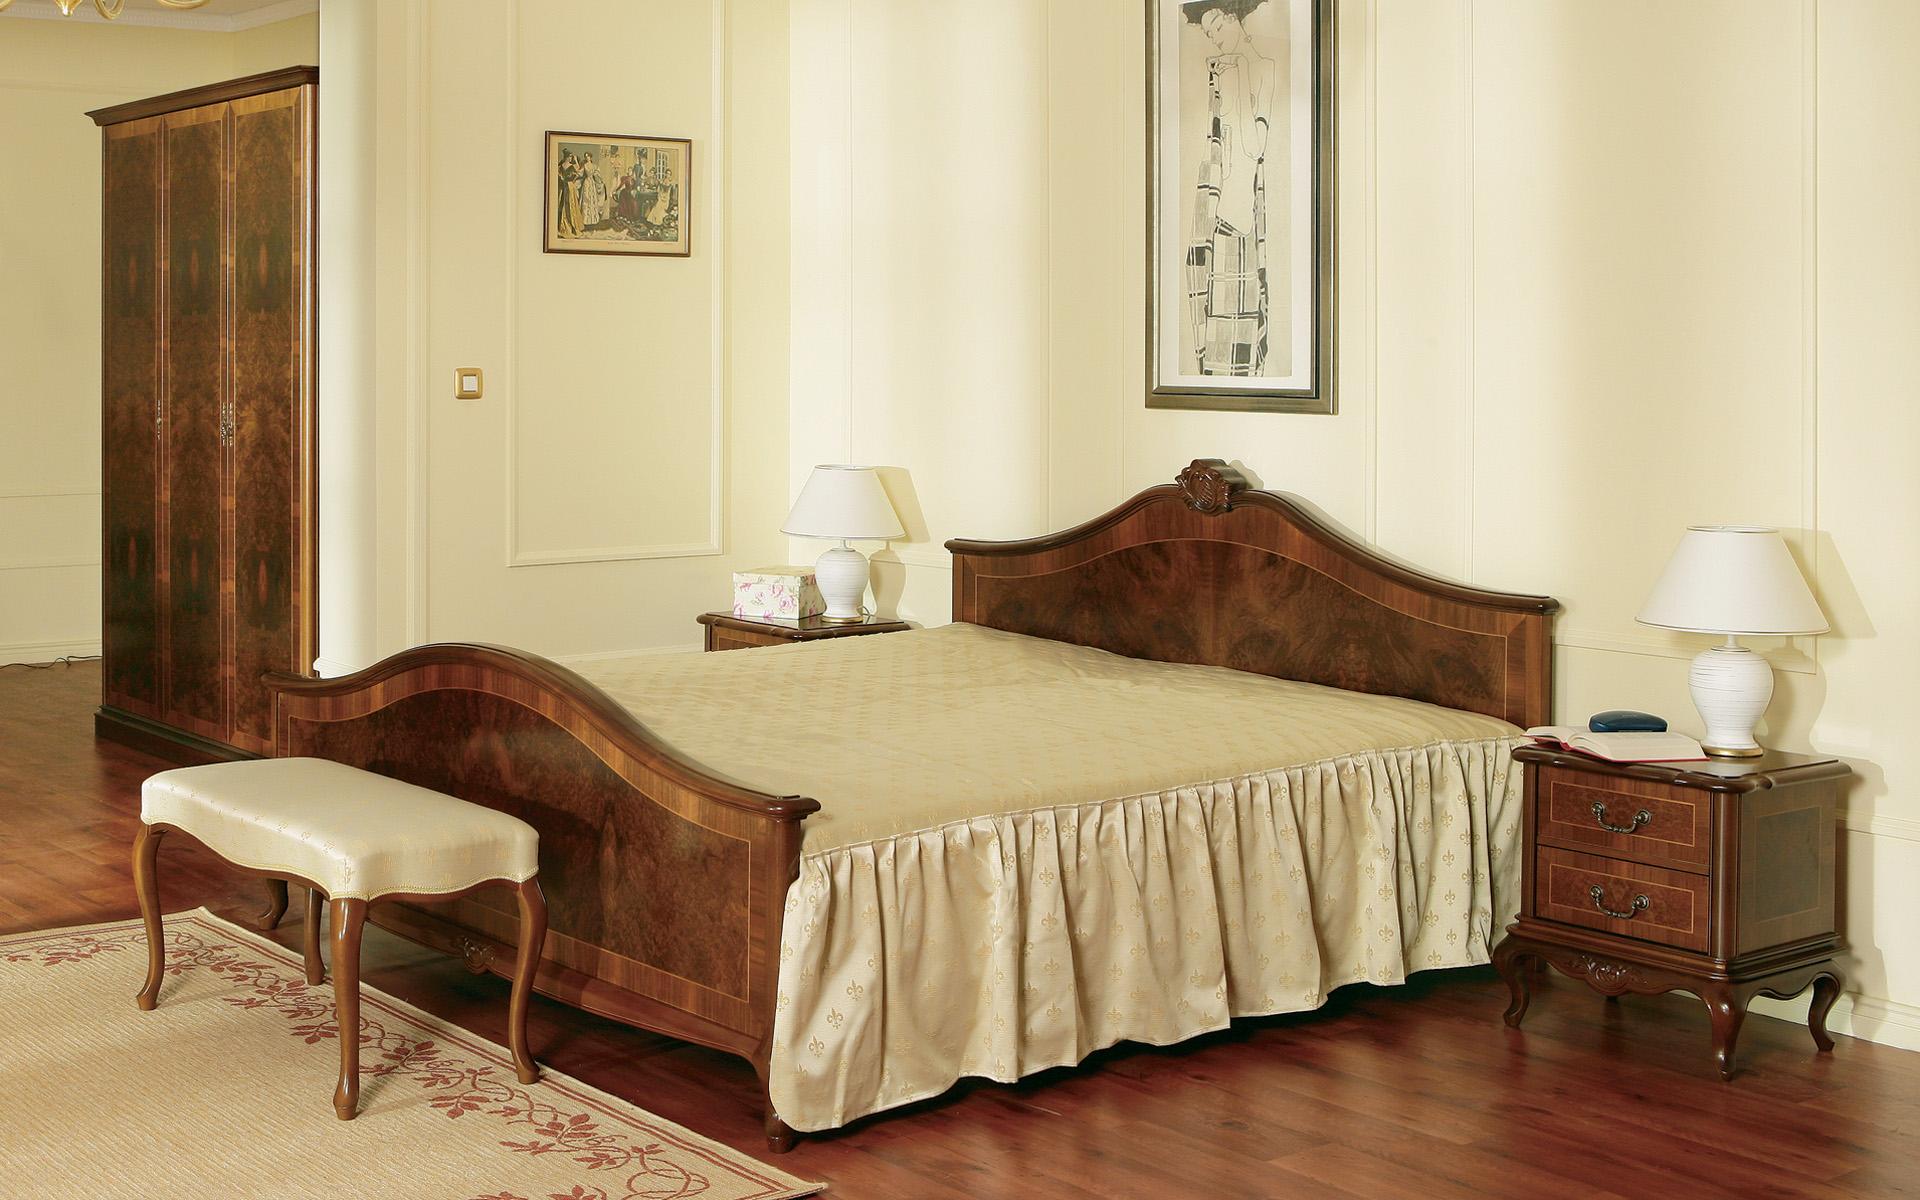 spalnica_bedroom_schlafzimmer_Barocco_klasicno-pohistvo_classic-furniture_Klassischen-Moebel_1